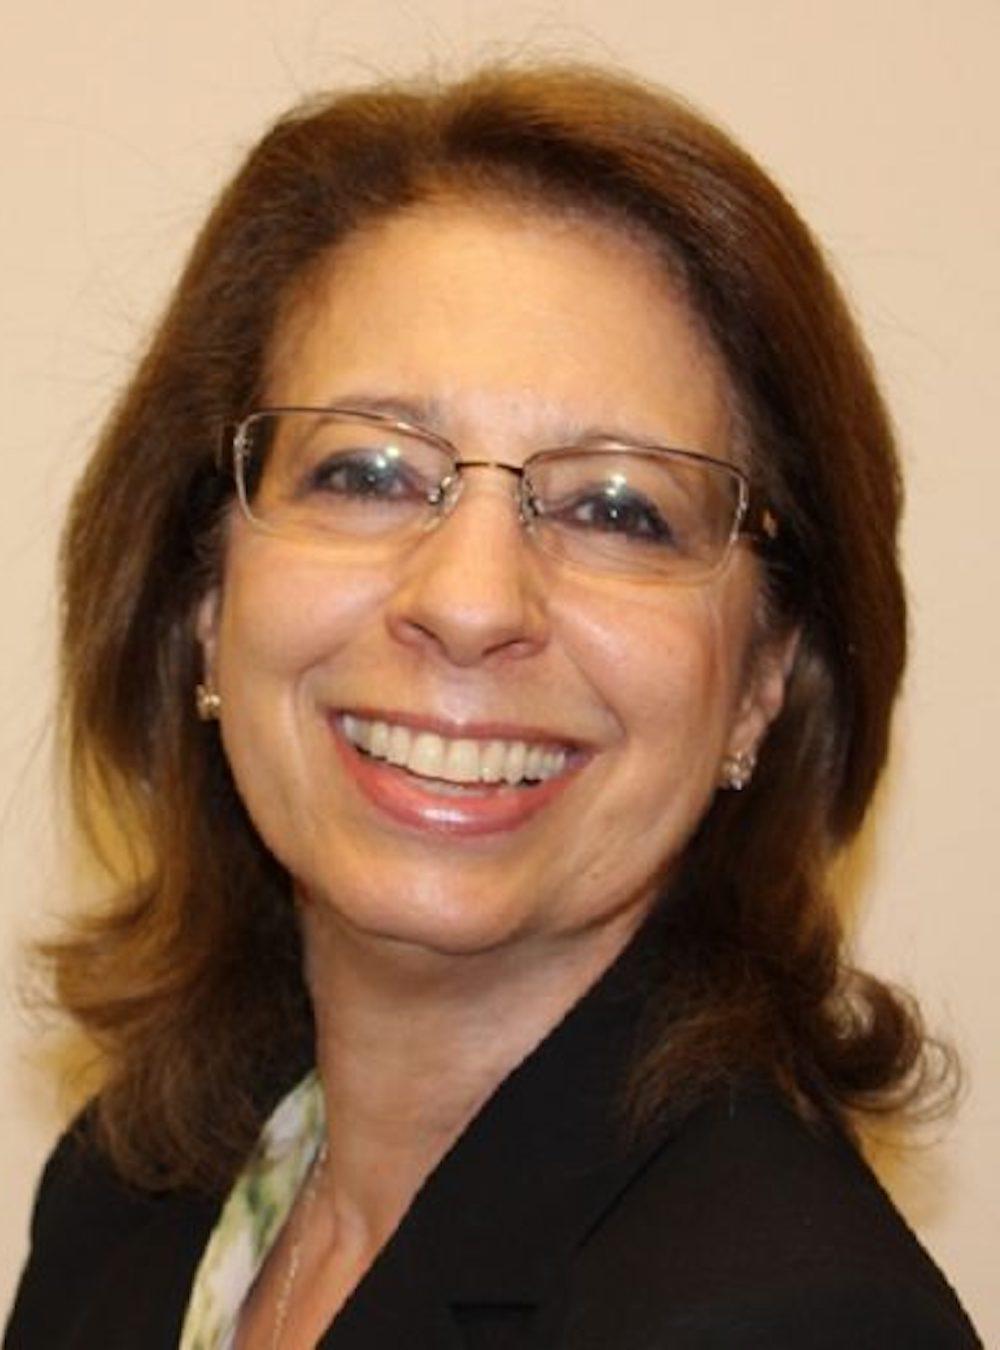 Portrait of Marisol Floren-Romero